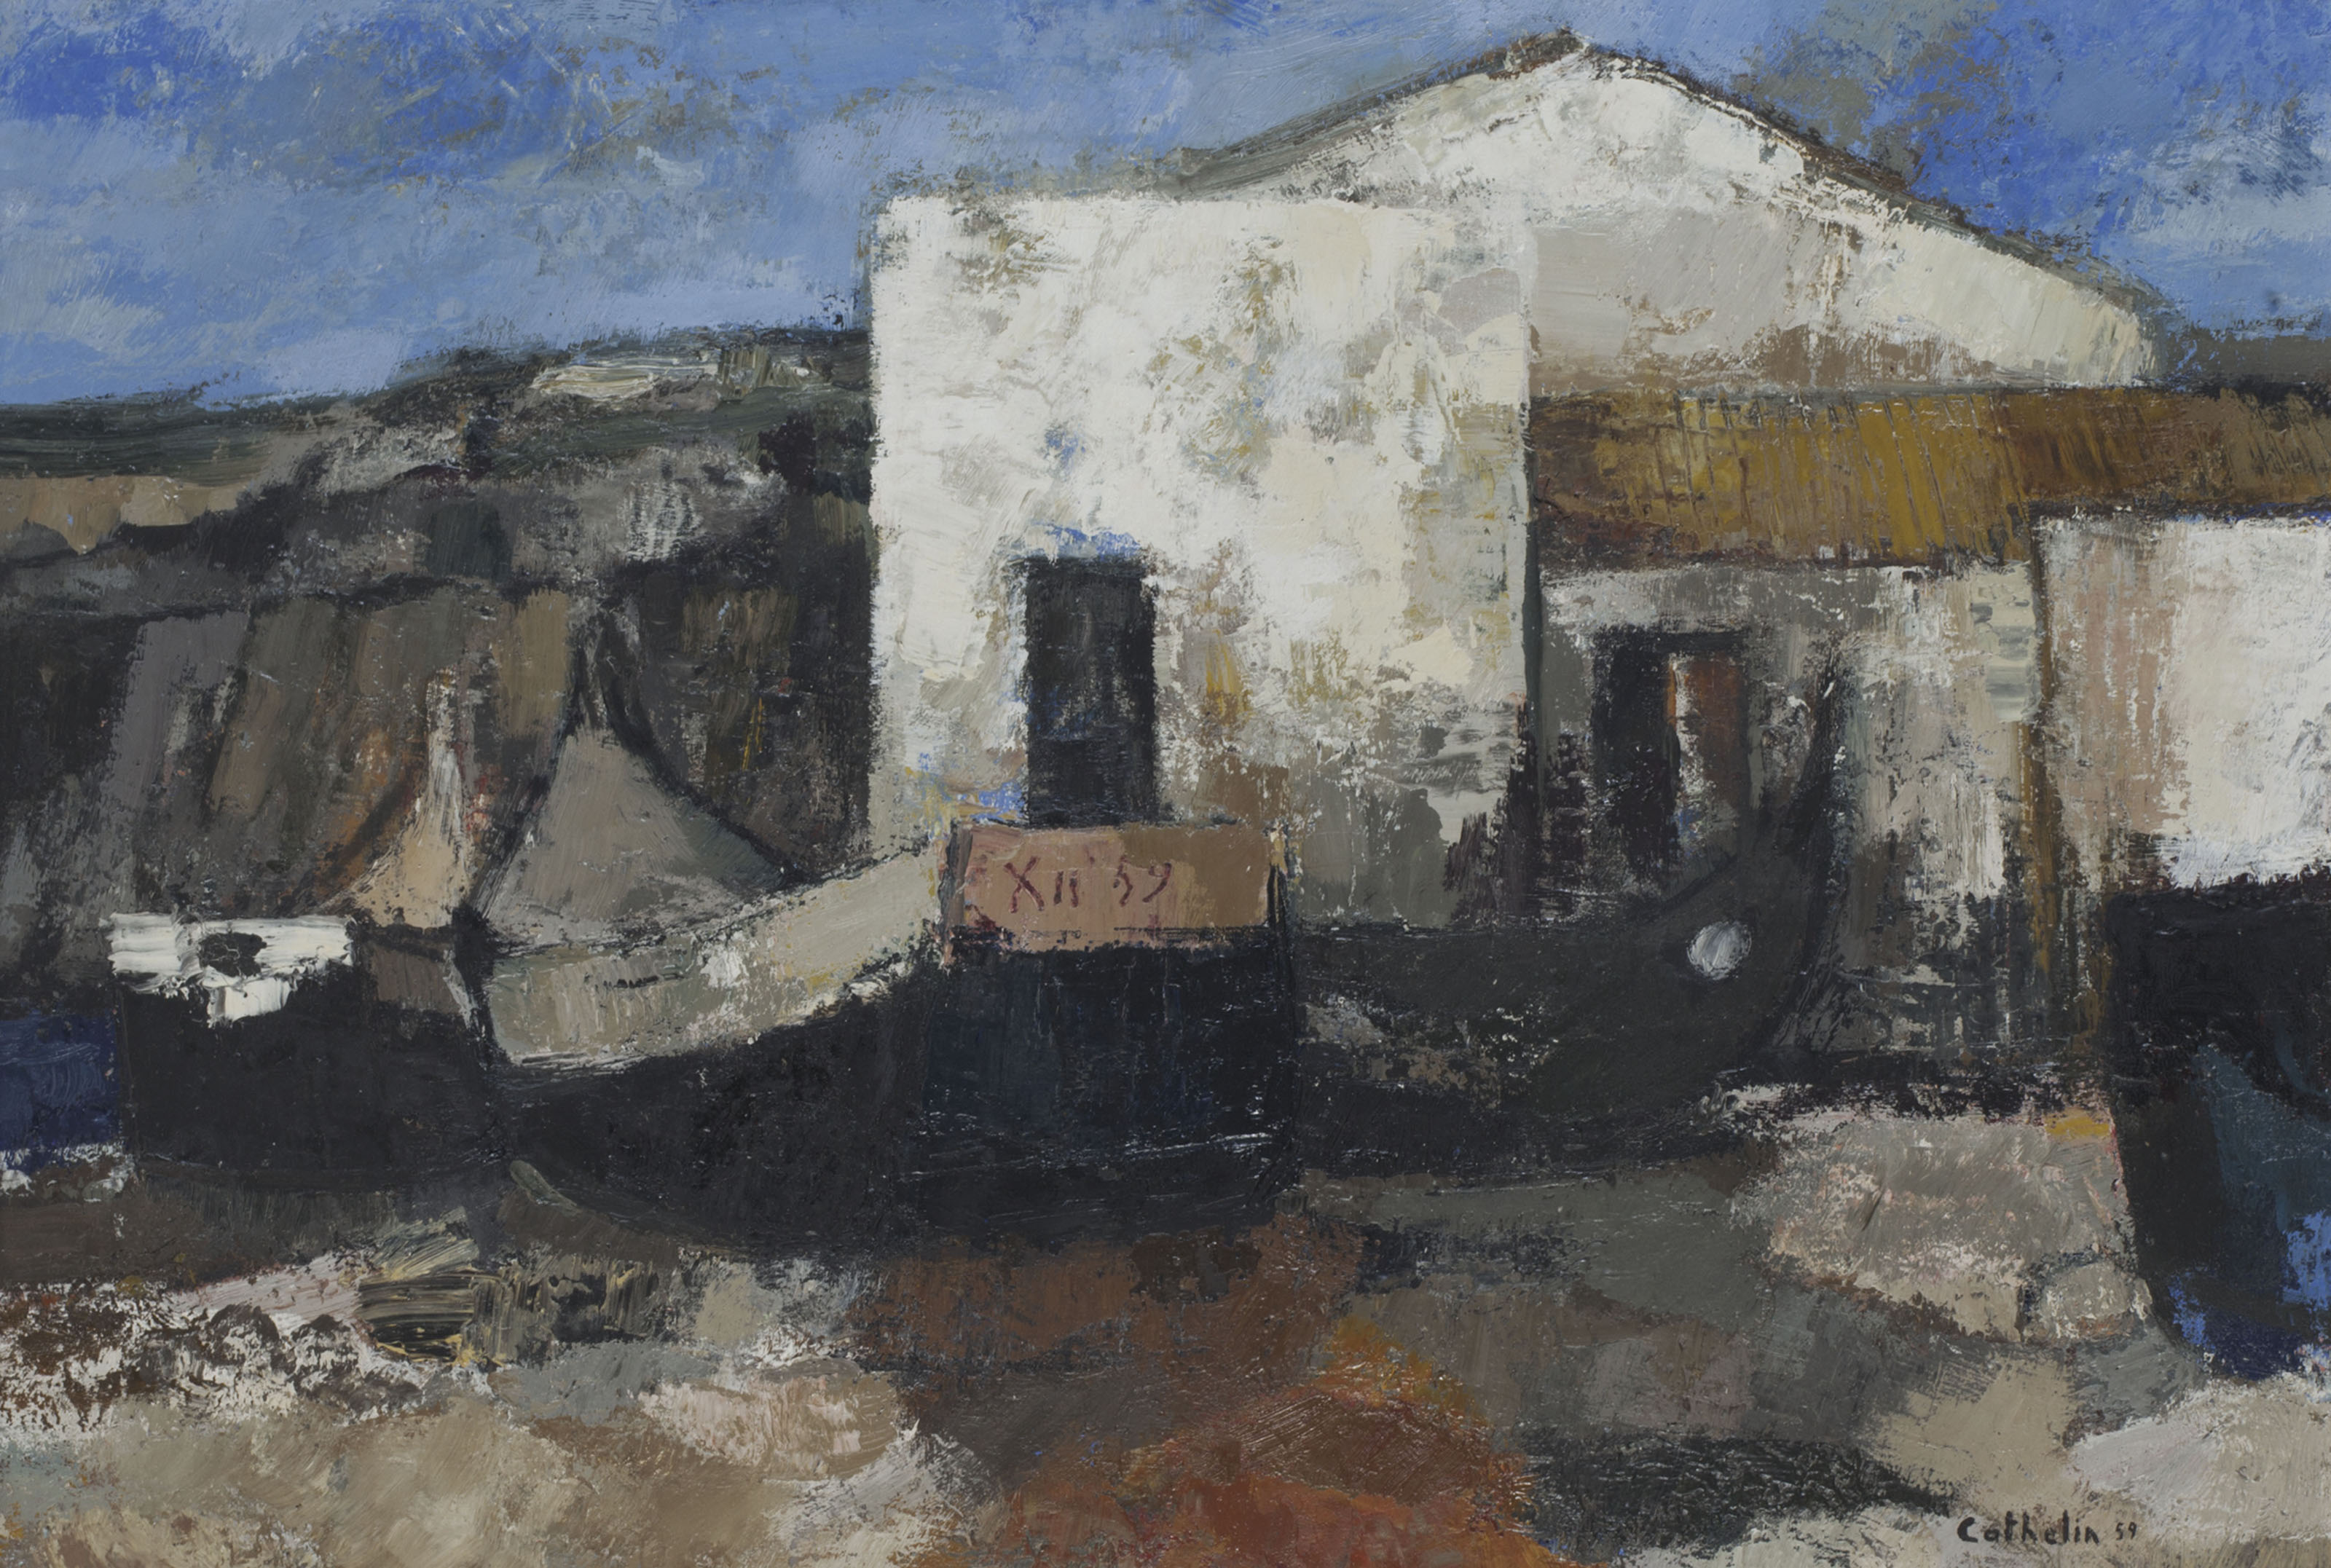 Bernard Cathelin (French, 1919